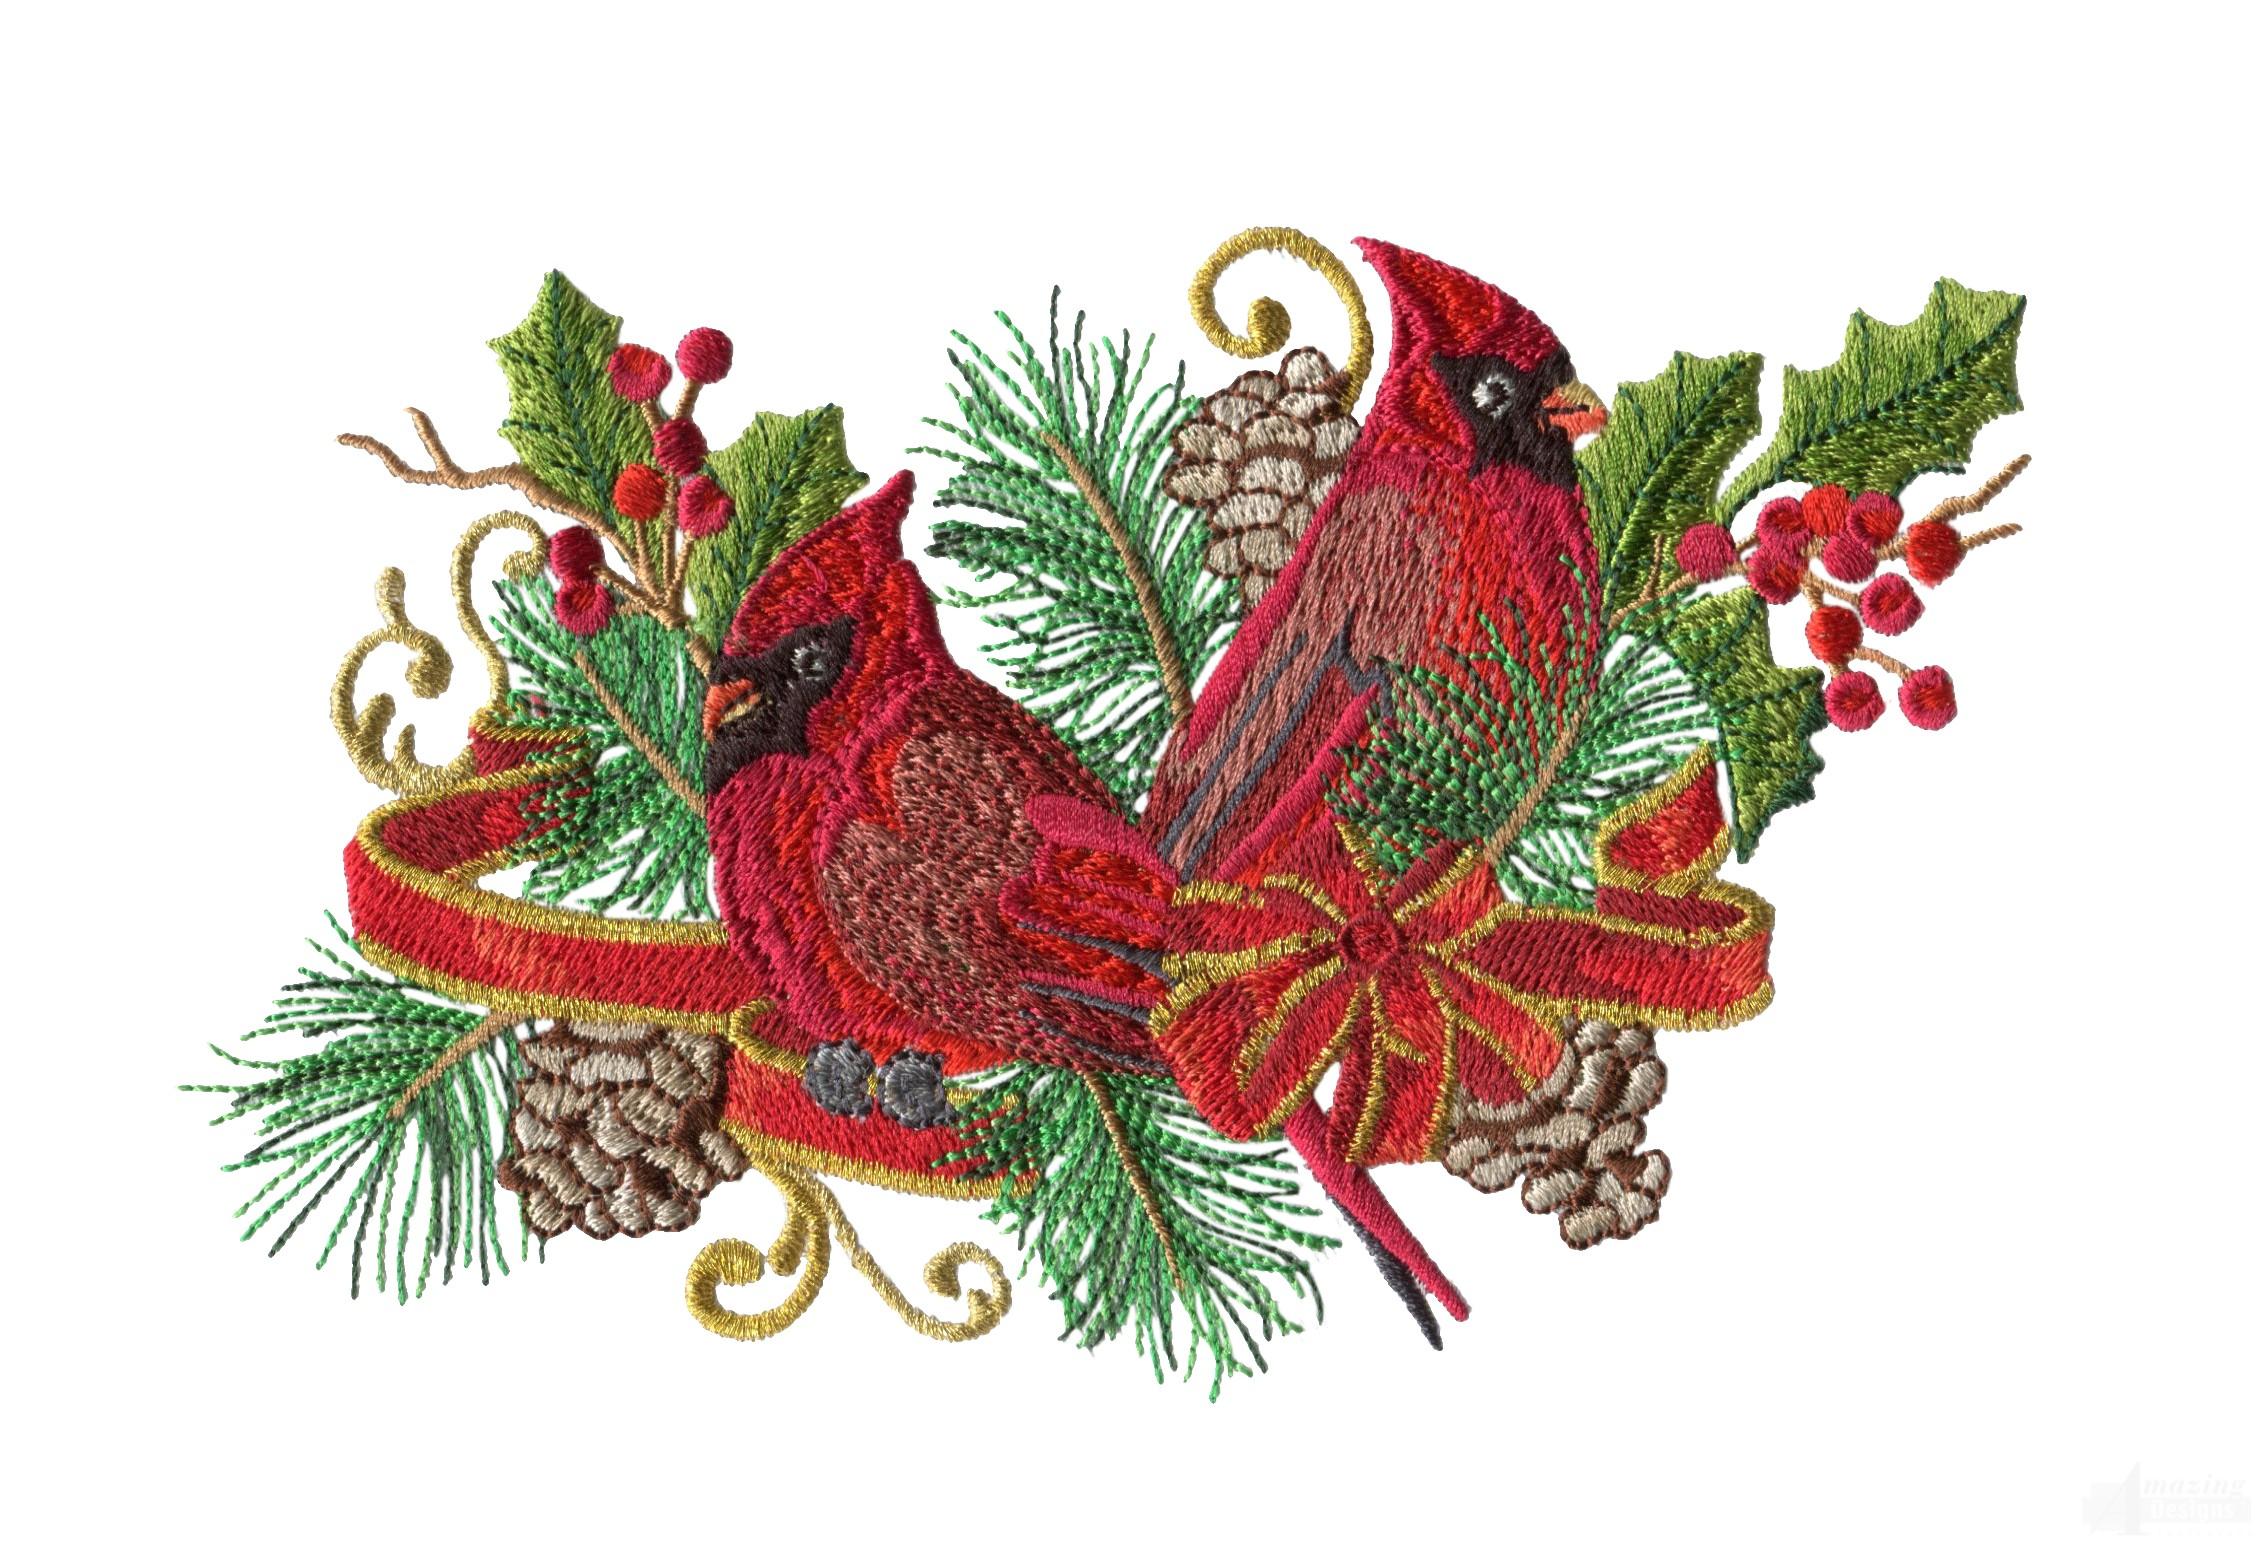 swnrcc130 regal cardinal embroidery design. Black Bedroom Furniture Sets. Home Design Ideas